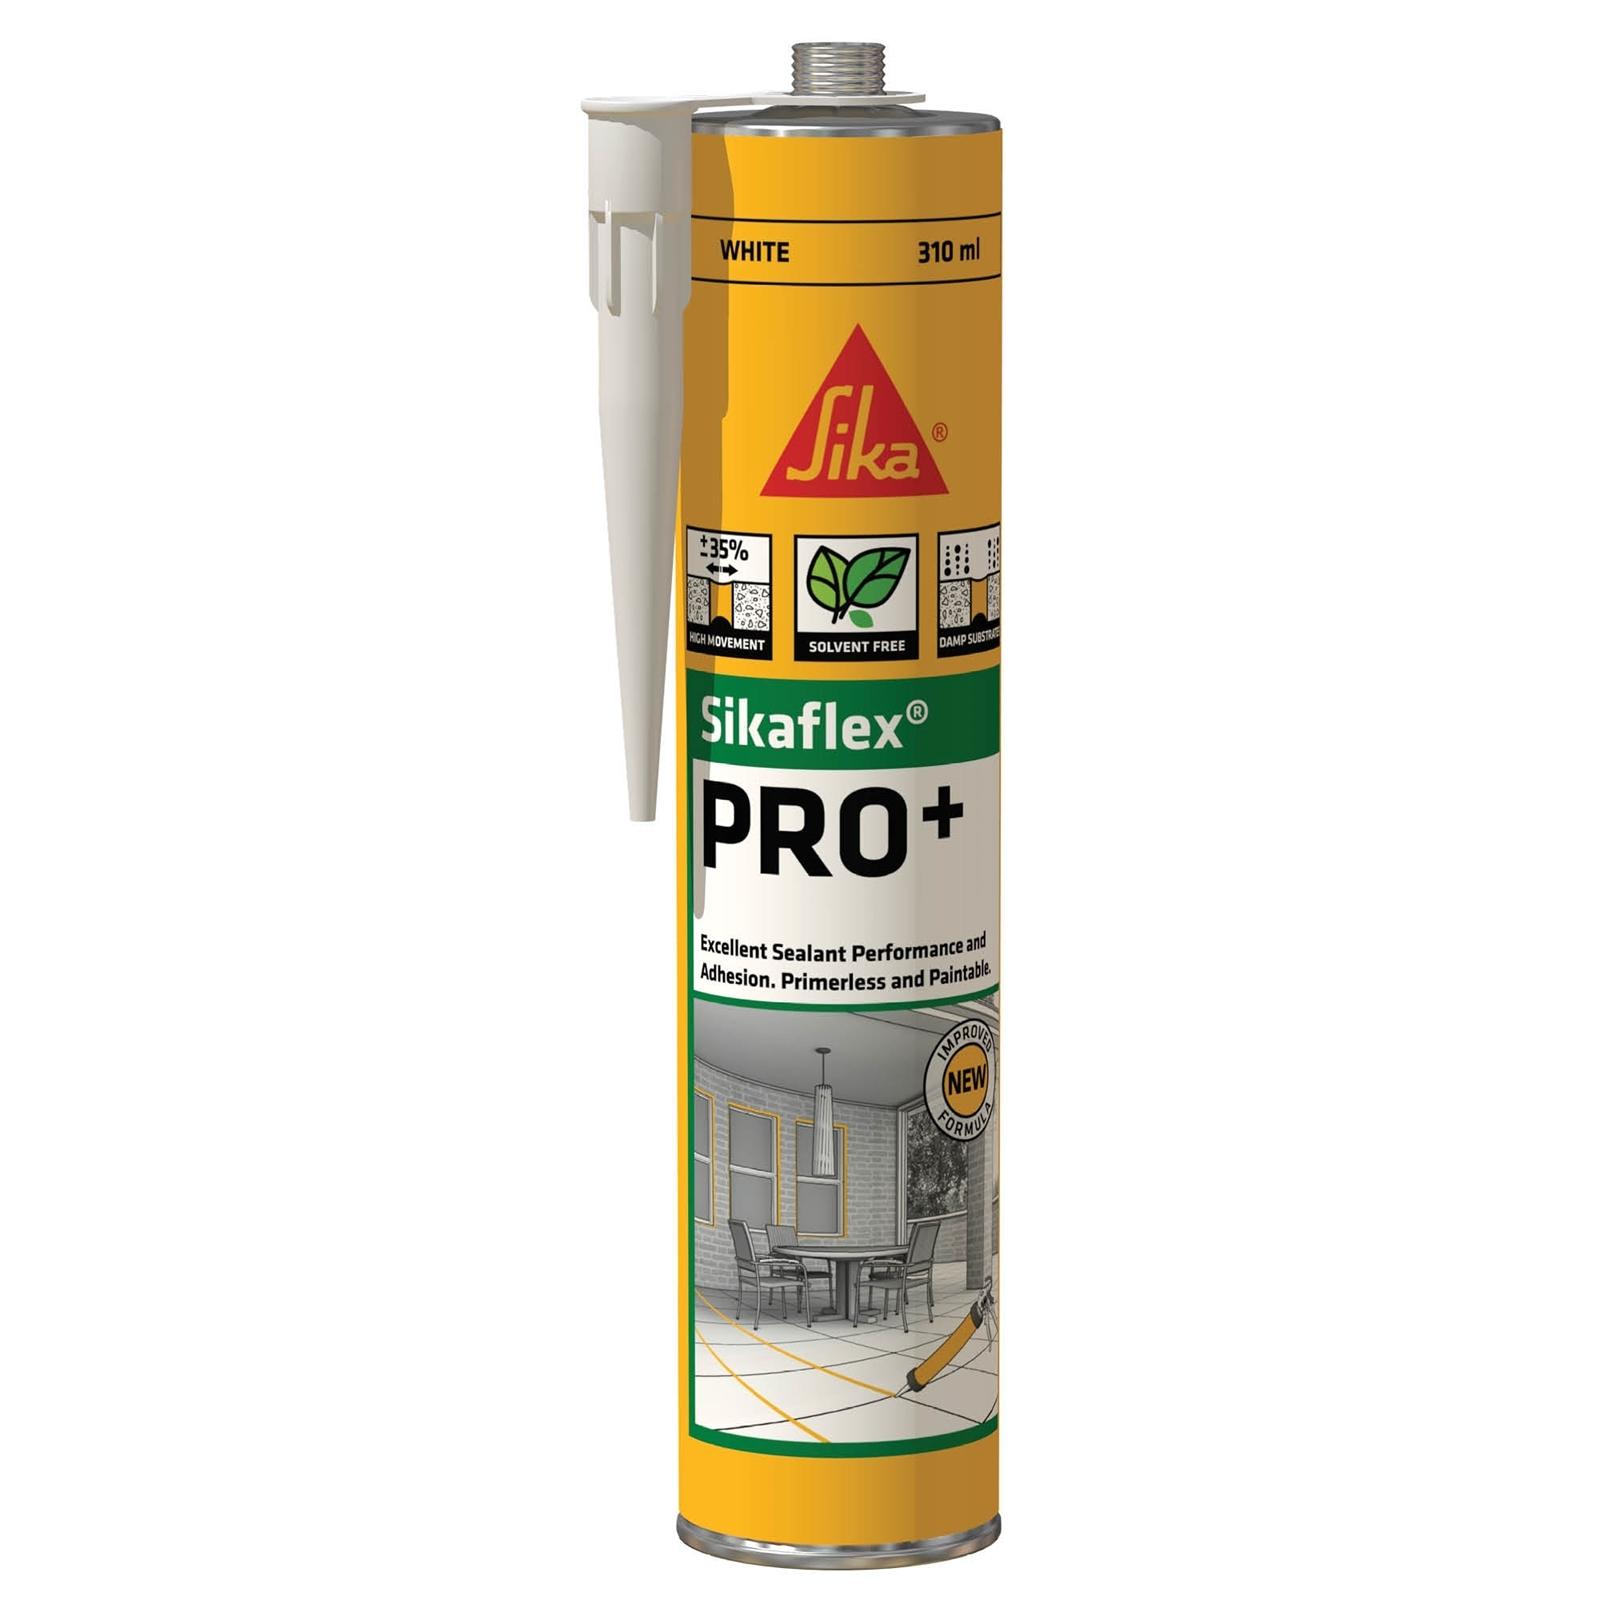 Sika 310ml White Sikaflex Pro+ Polyurethane Sealant